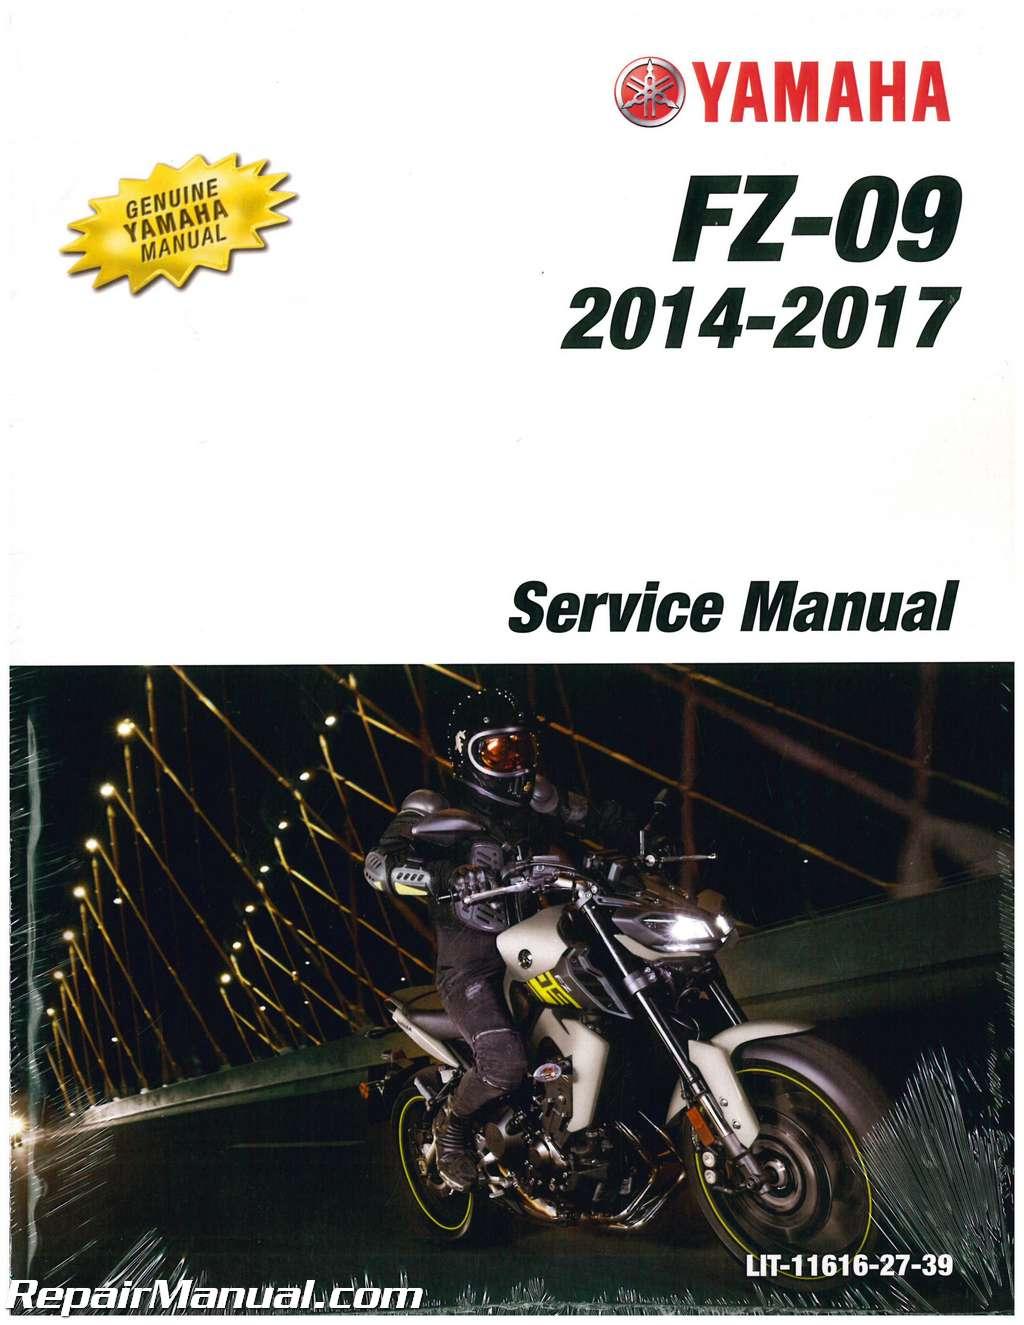 2014 2016 yamaha fz 09 motorcycle service manual 850cc rh repairmanual com yamaha fzs manual pdf yamaha fz 07 manual